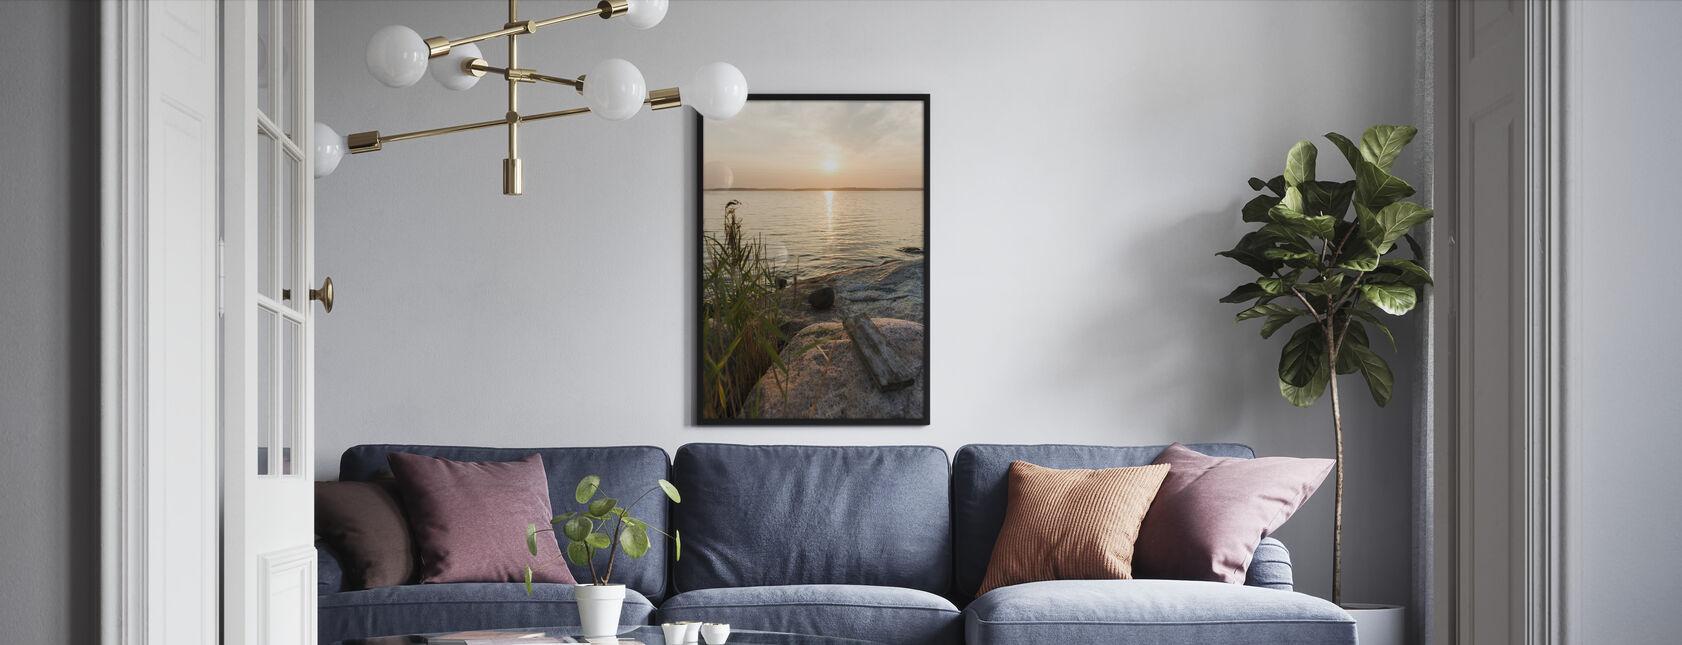 Sunset over Nässlingen, Sweden - Inramad tavla - Vardagsrum